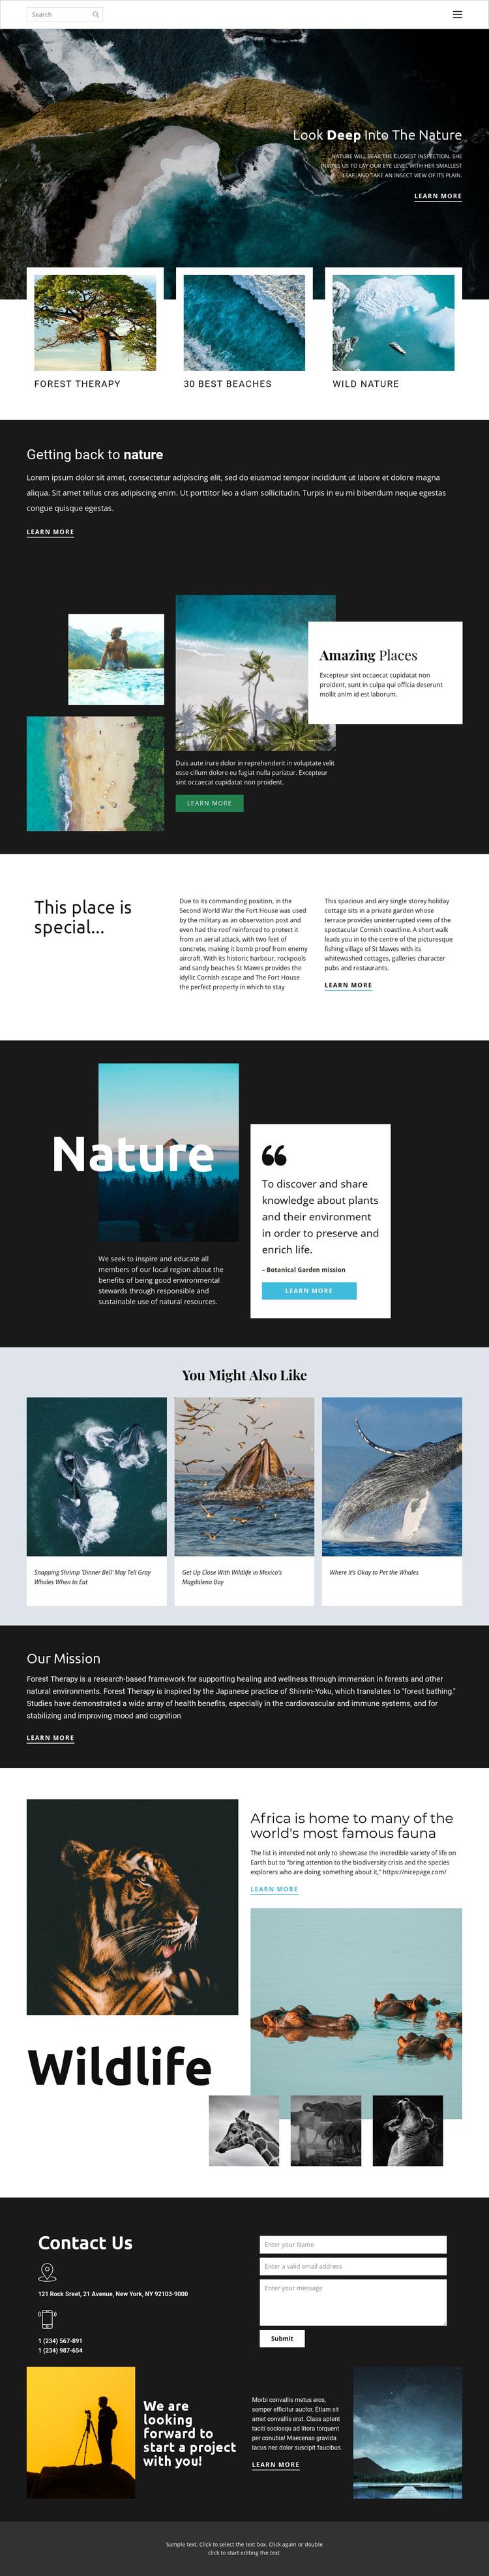 Exploring wildlife and nature Joomla Page Builder